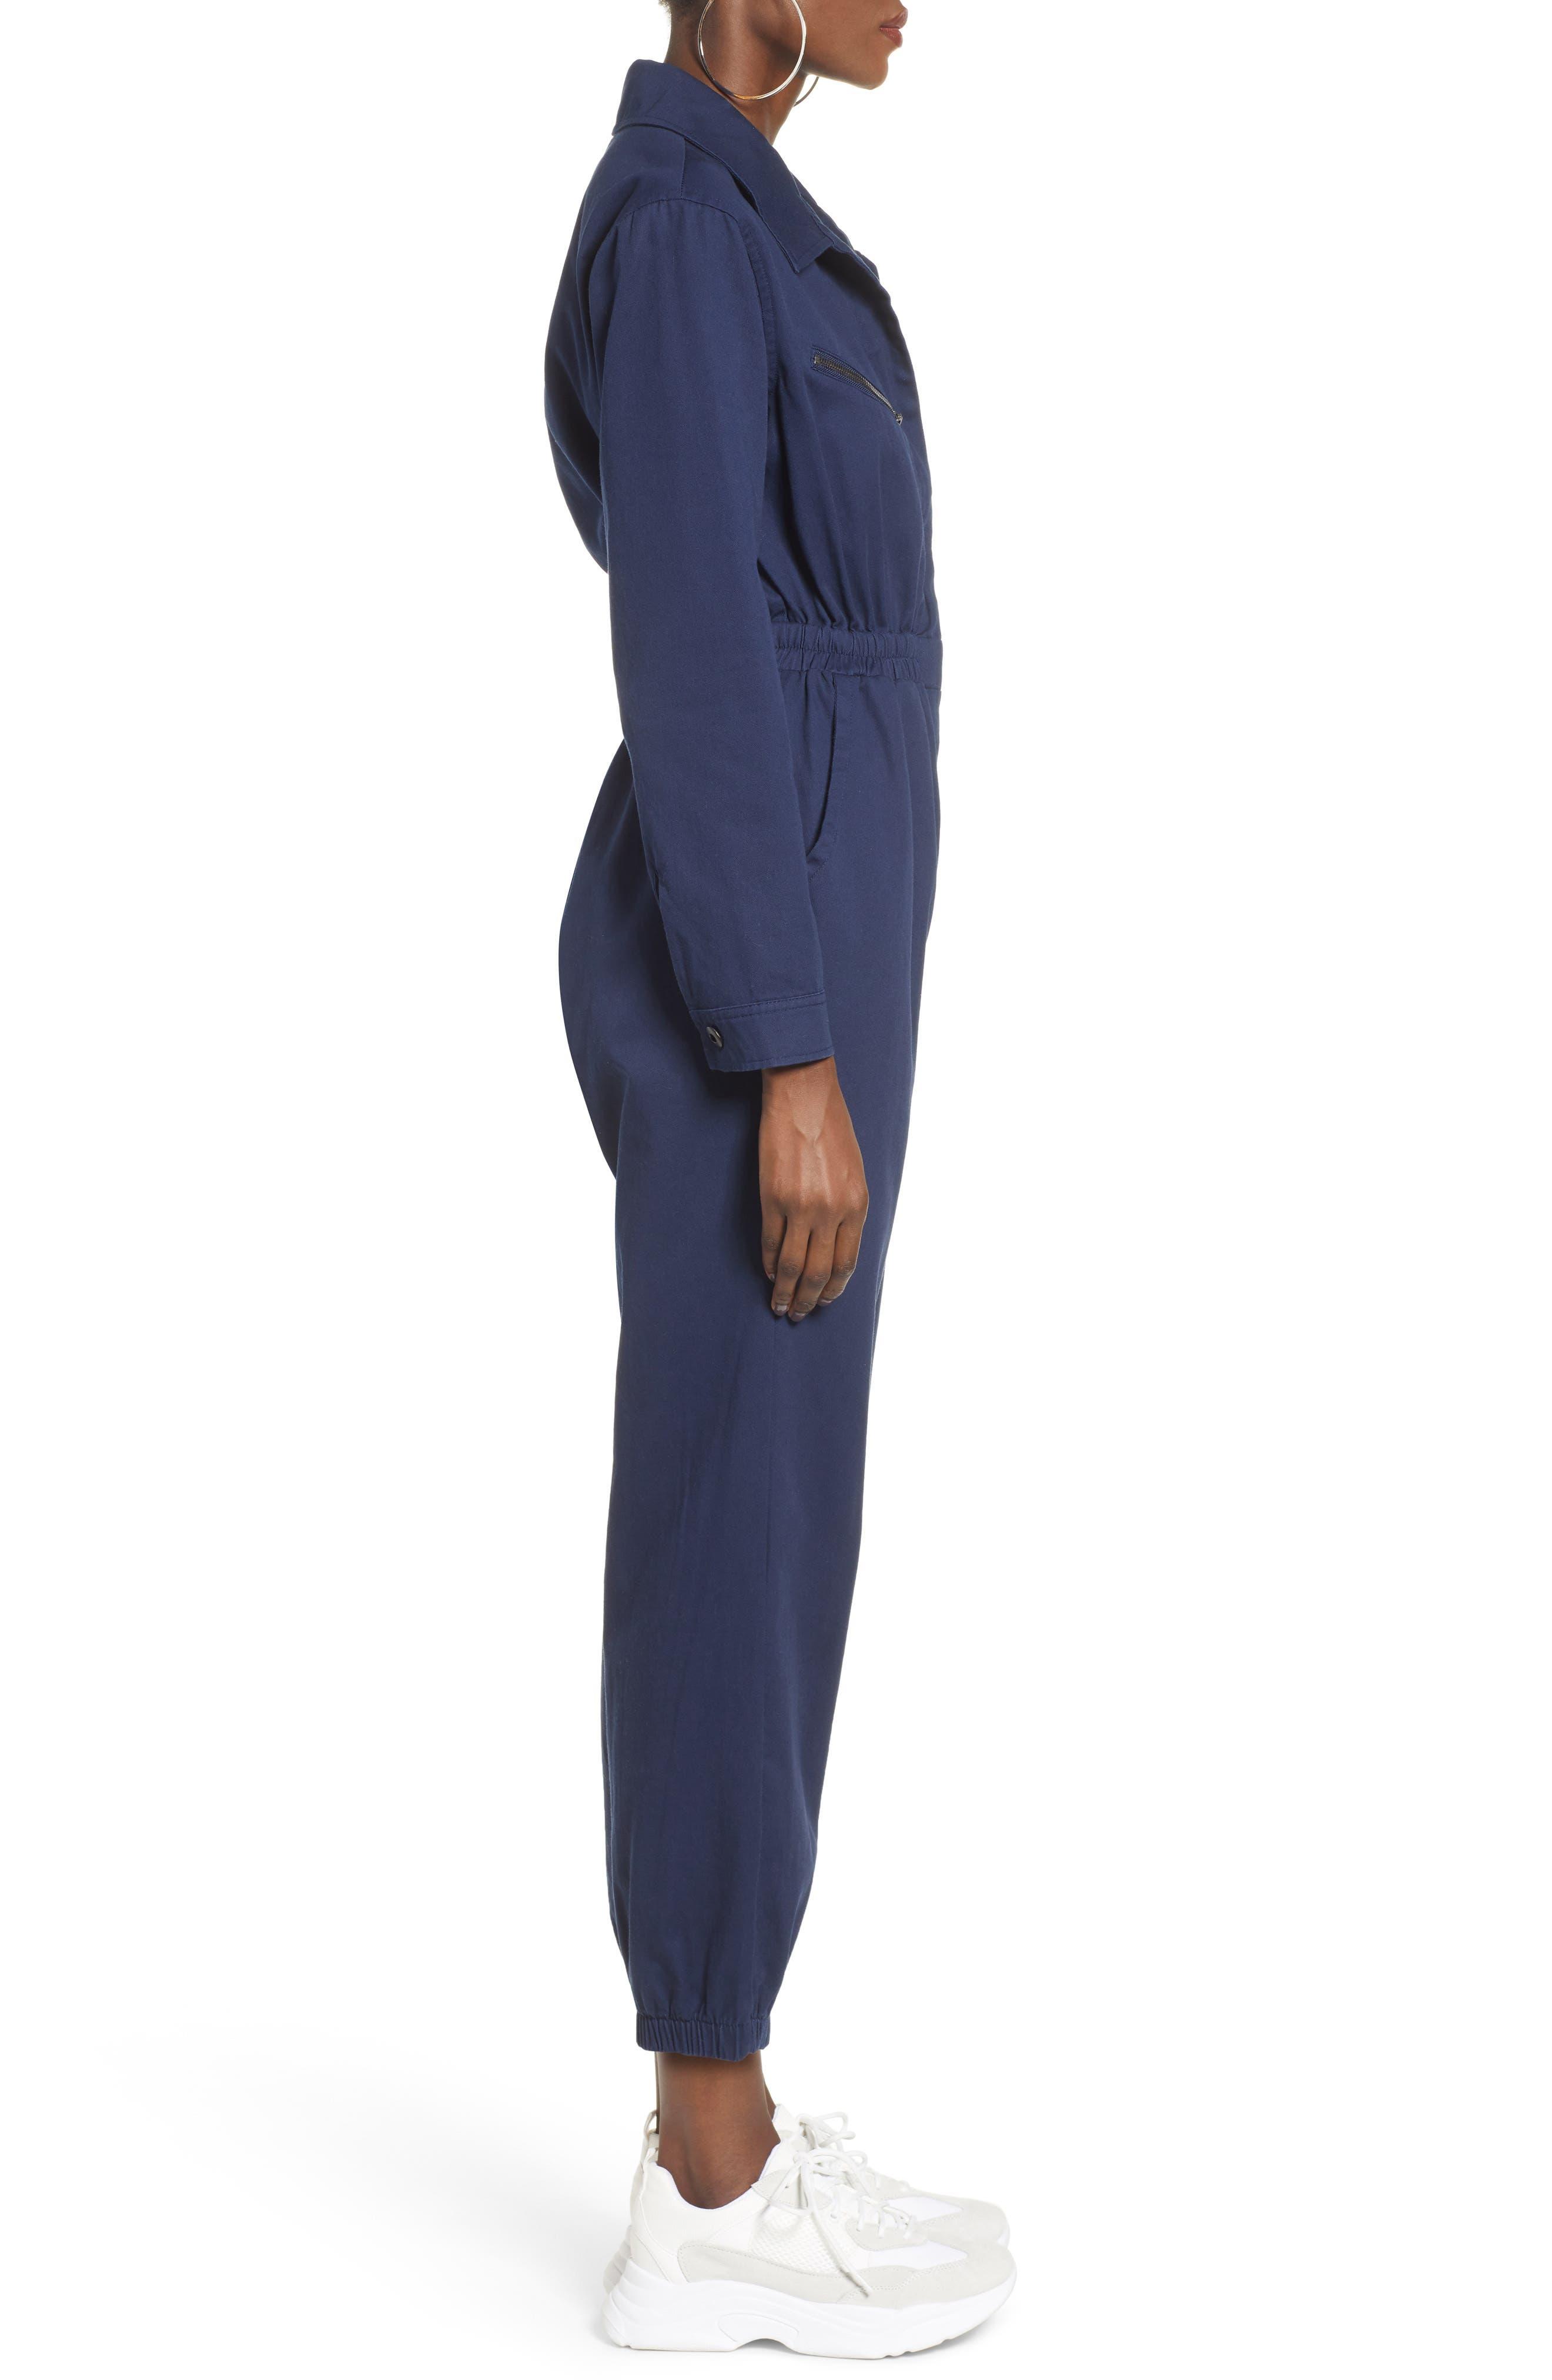 TEN SIXTY SHERMAN, Twill Workwear Jumpsuit, Alternate thumbnail 4, color, 400